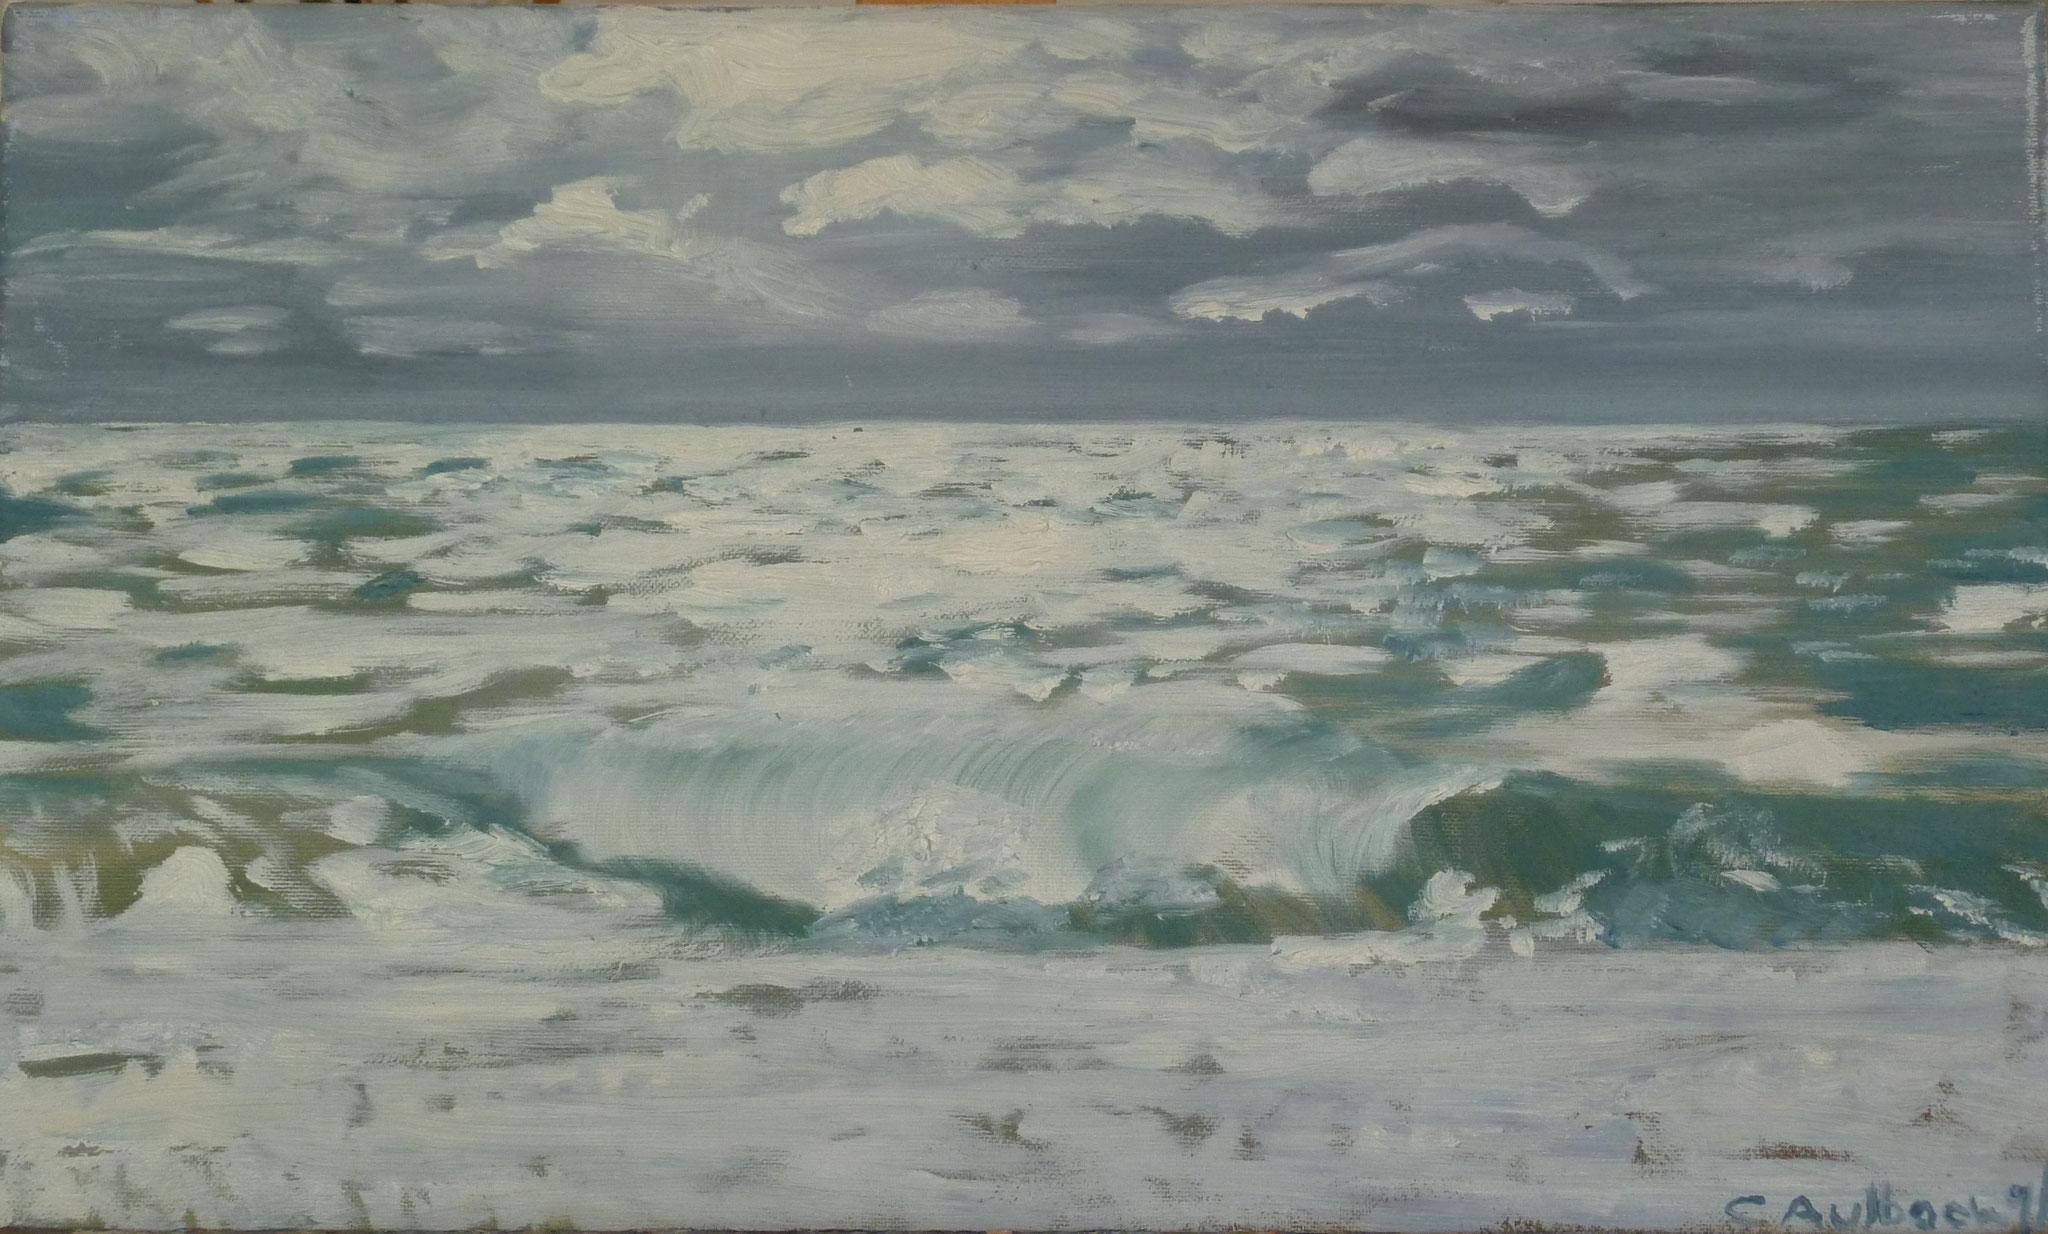 Nordsee, 2002, 30 x 50cm, Öl auf Leinwand